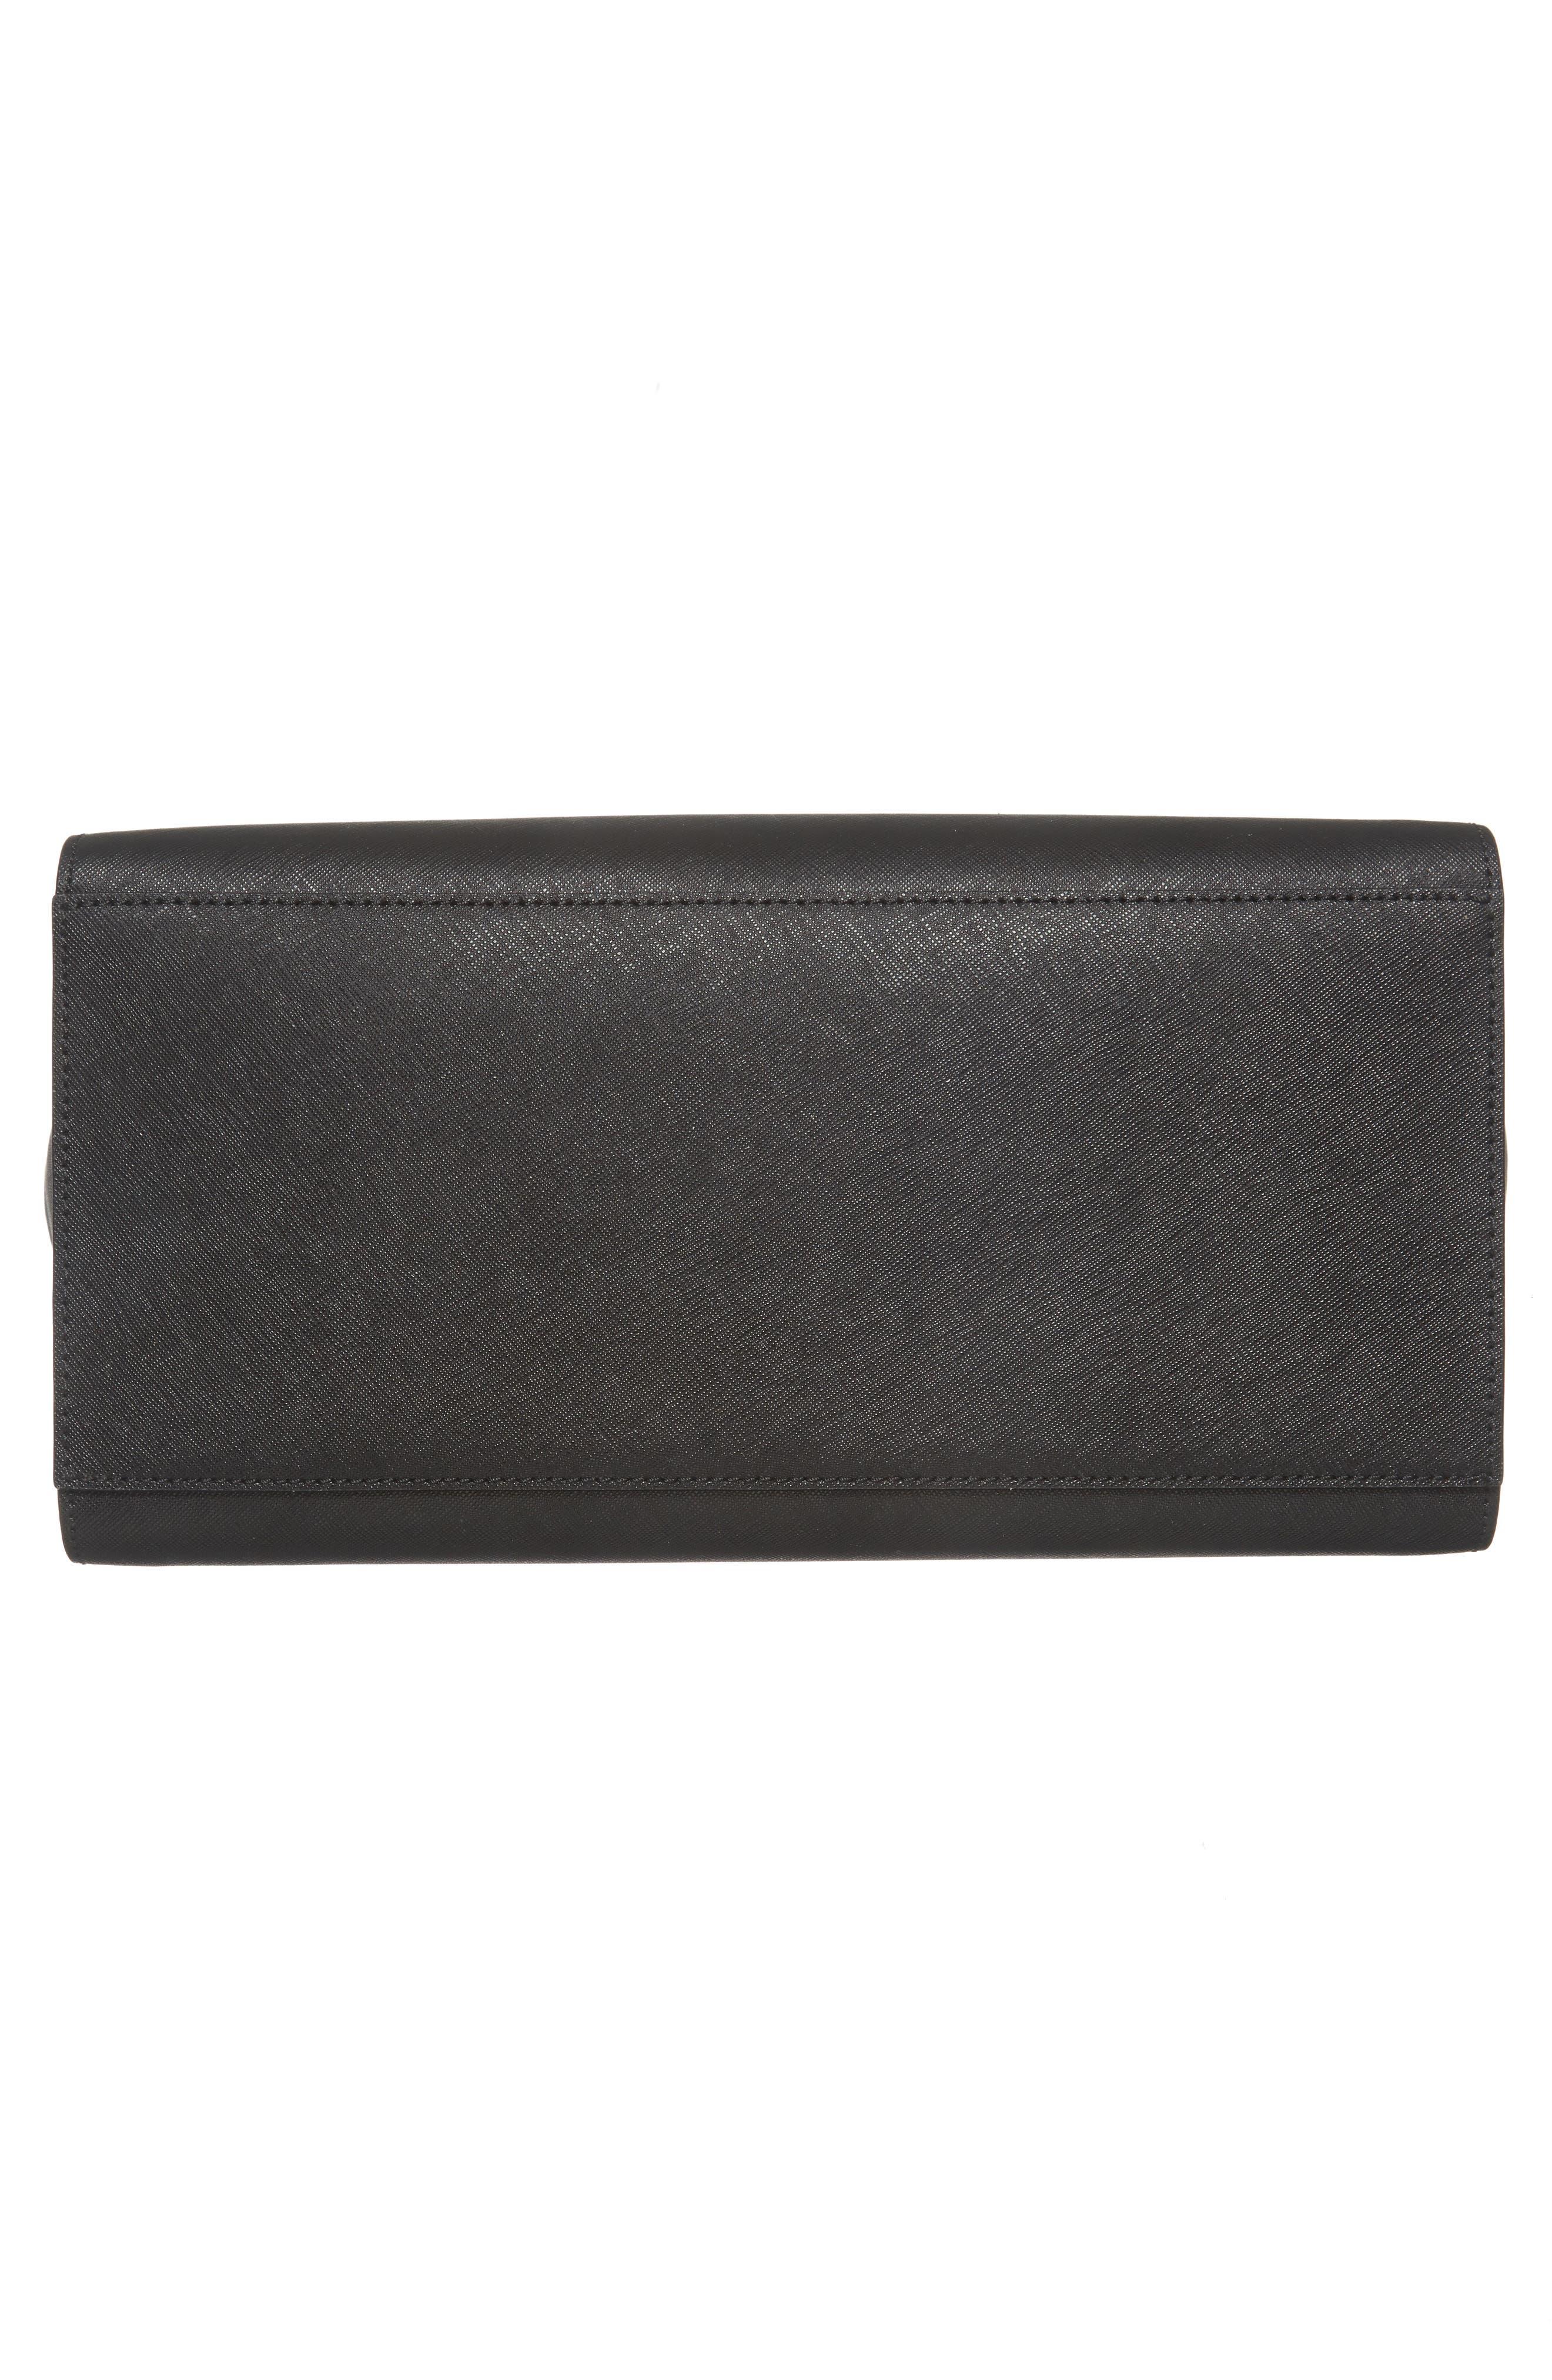 make it mine - candace leather satchel,                             Alternate thumbnail 11, color,